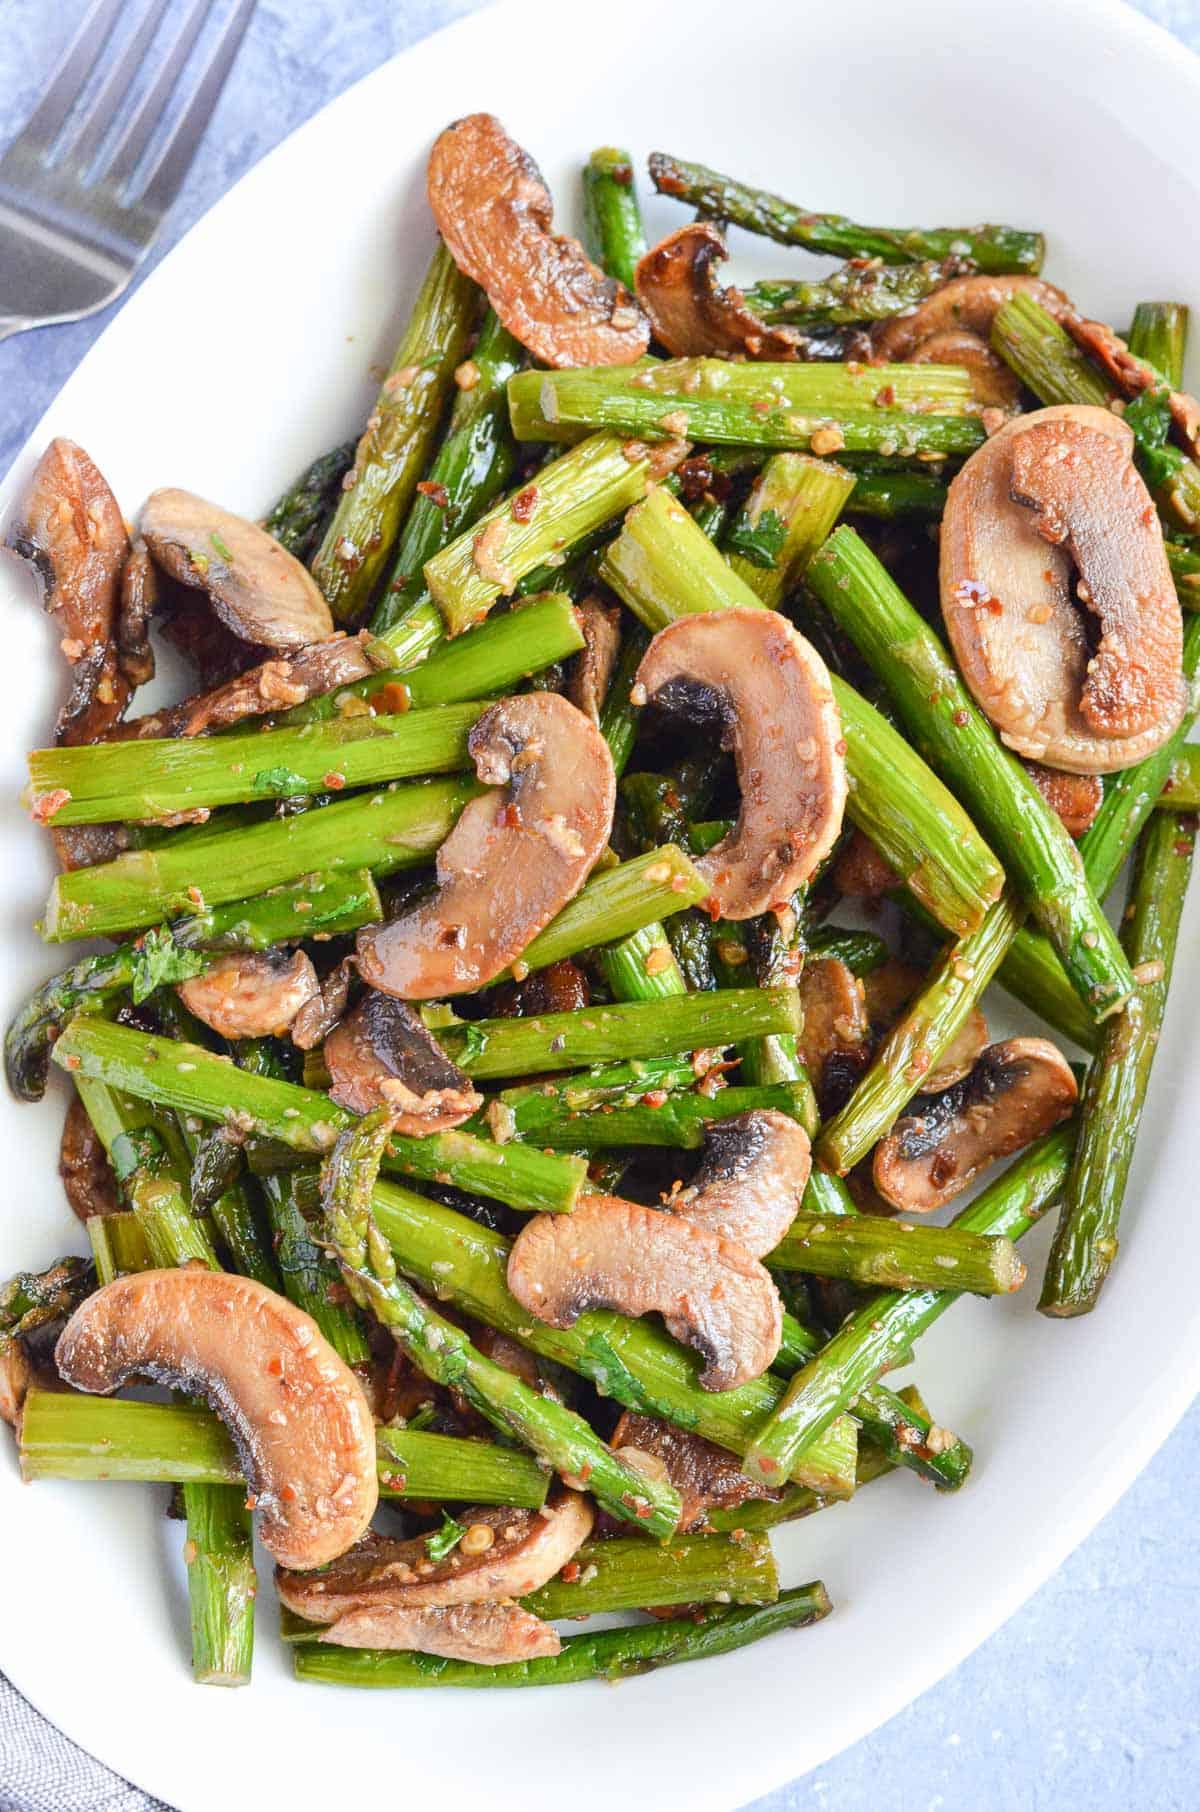 a close up click of the veggies.